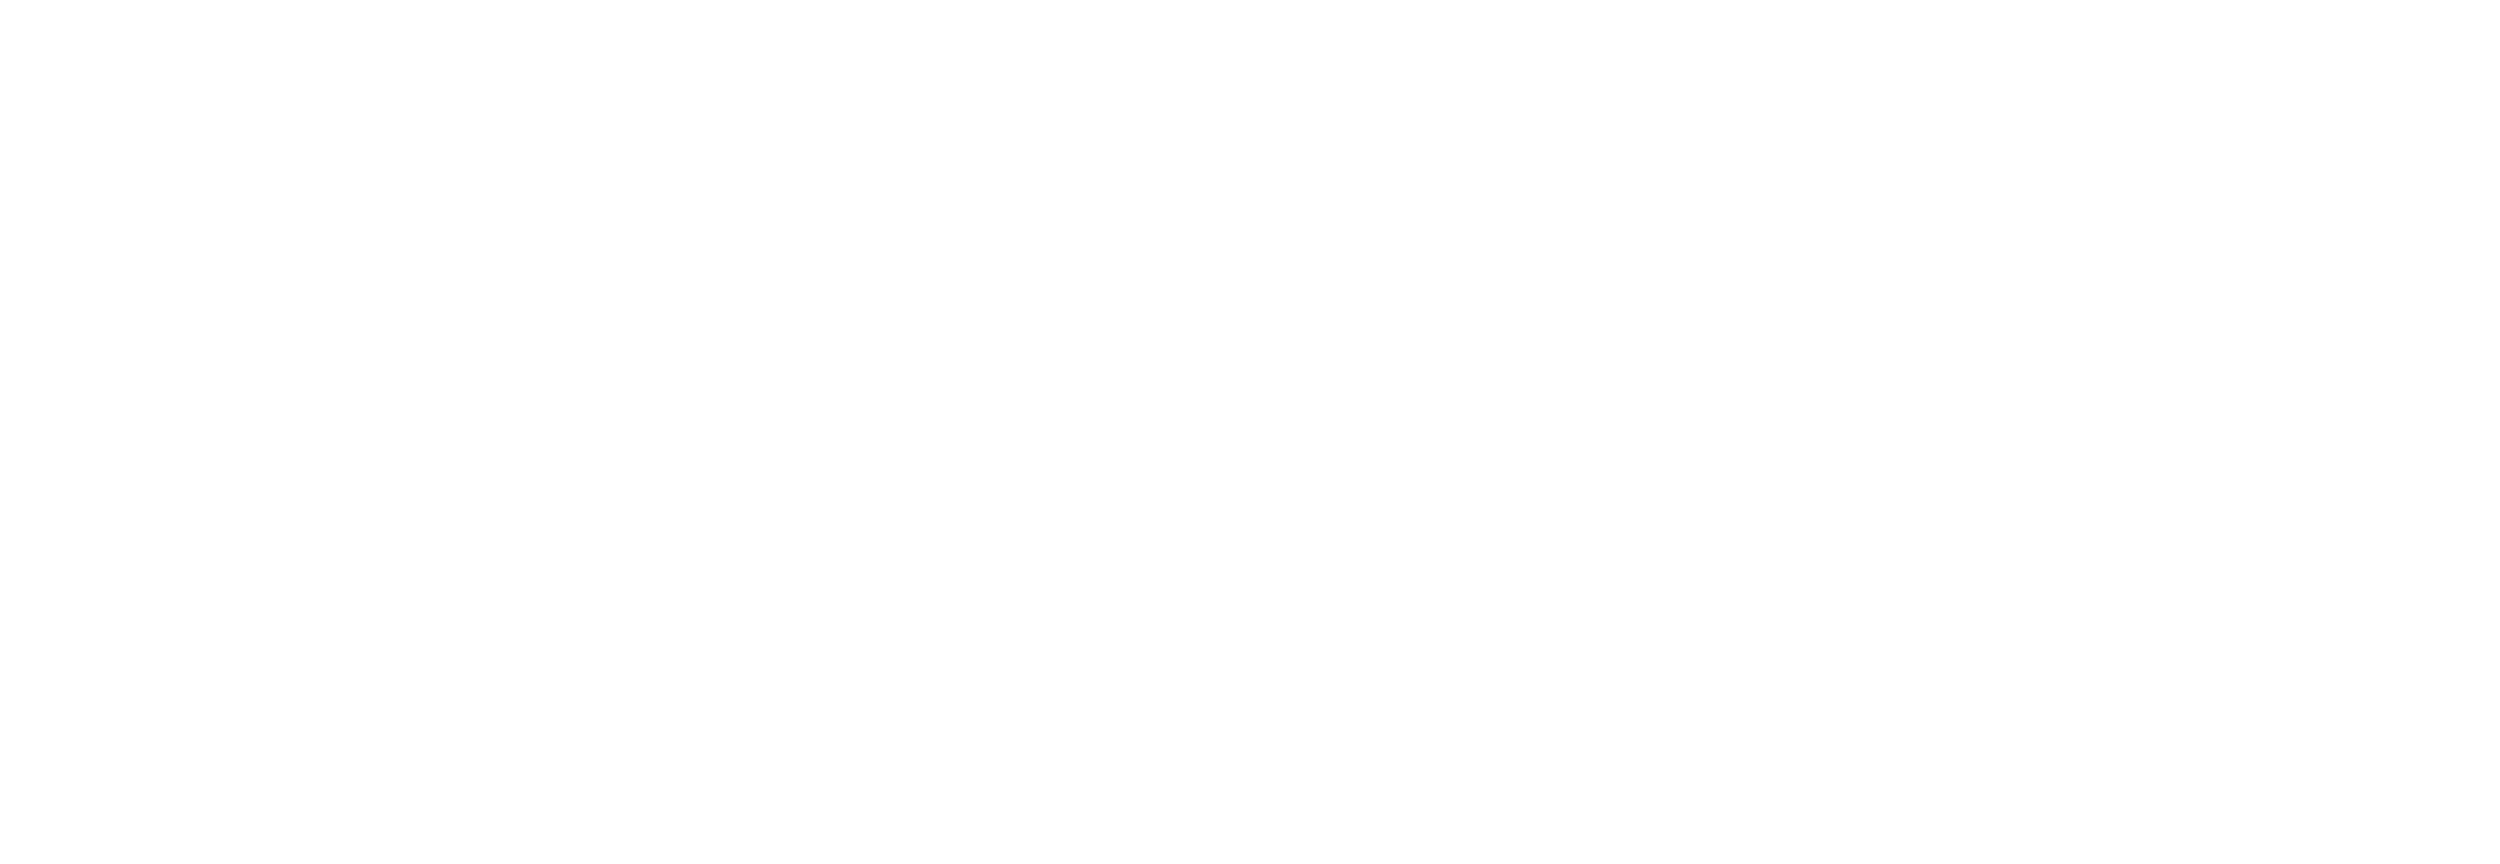 Damaged Product Inside Cardboard Box Icon